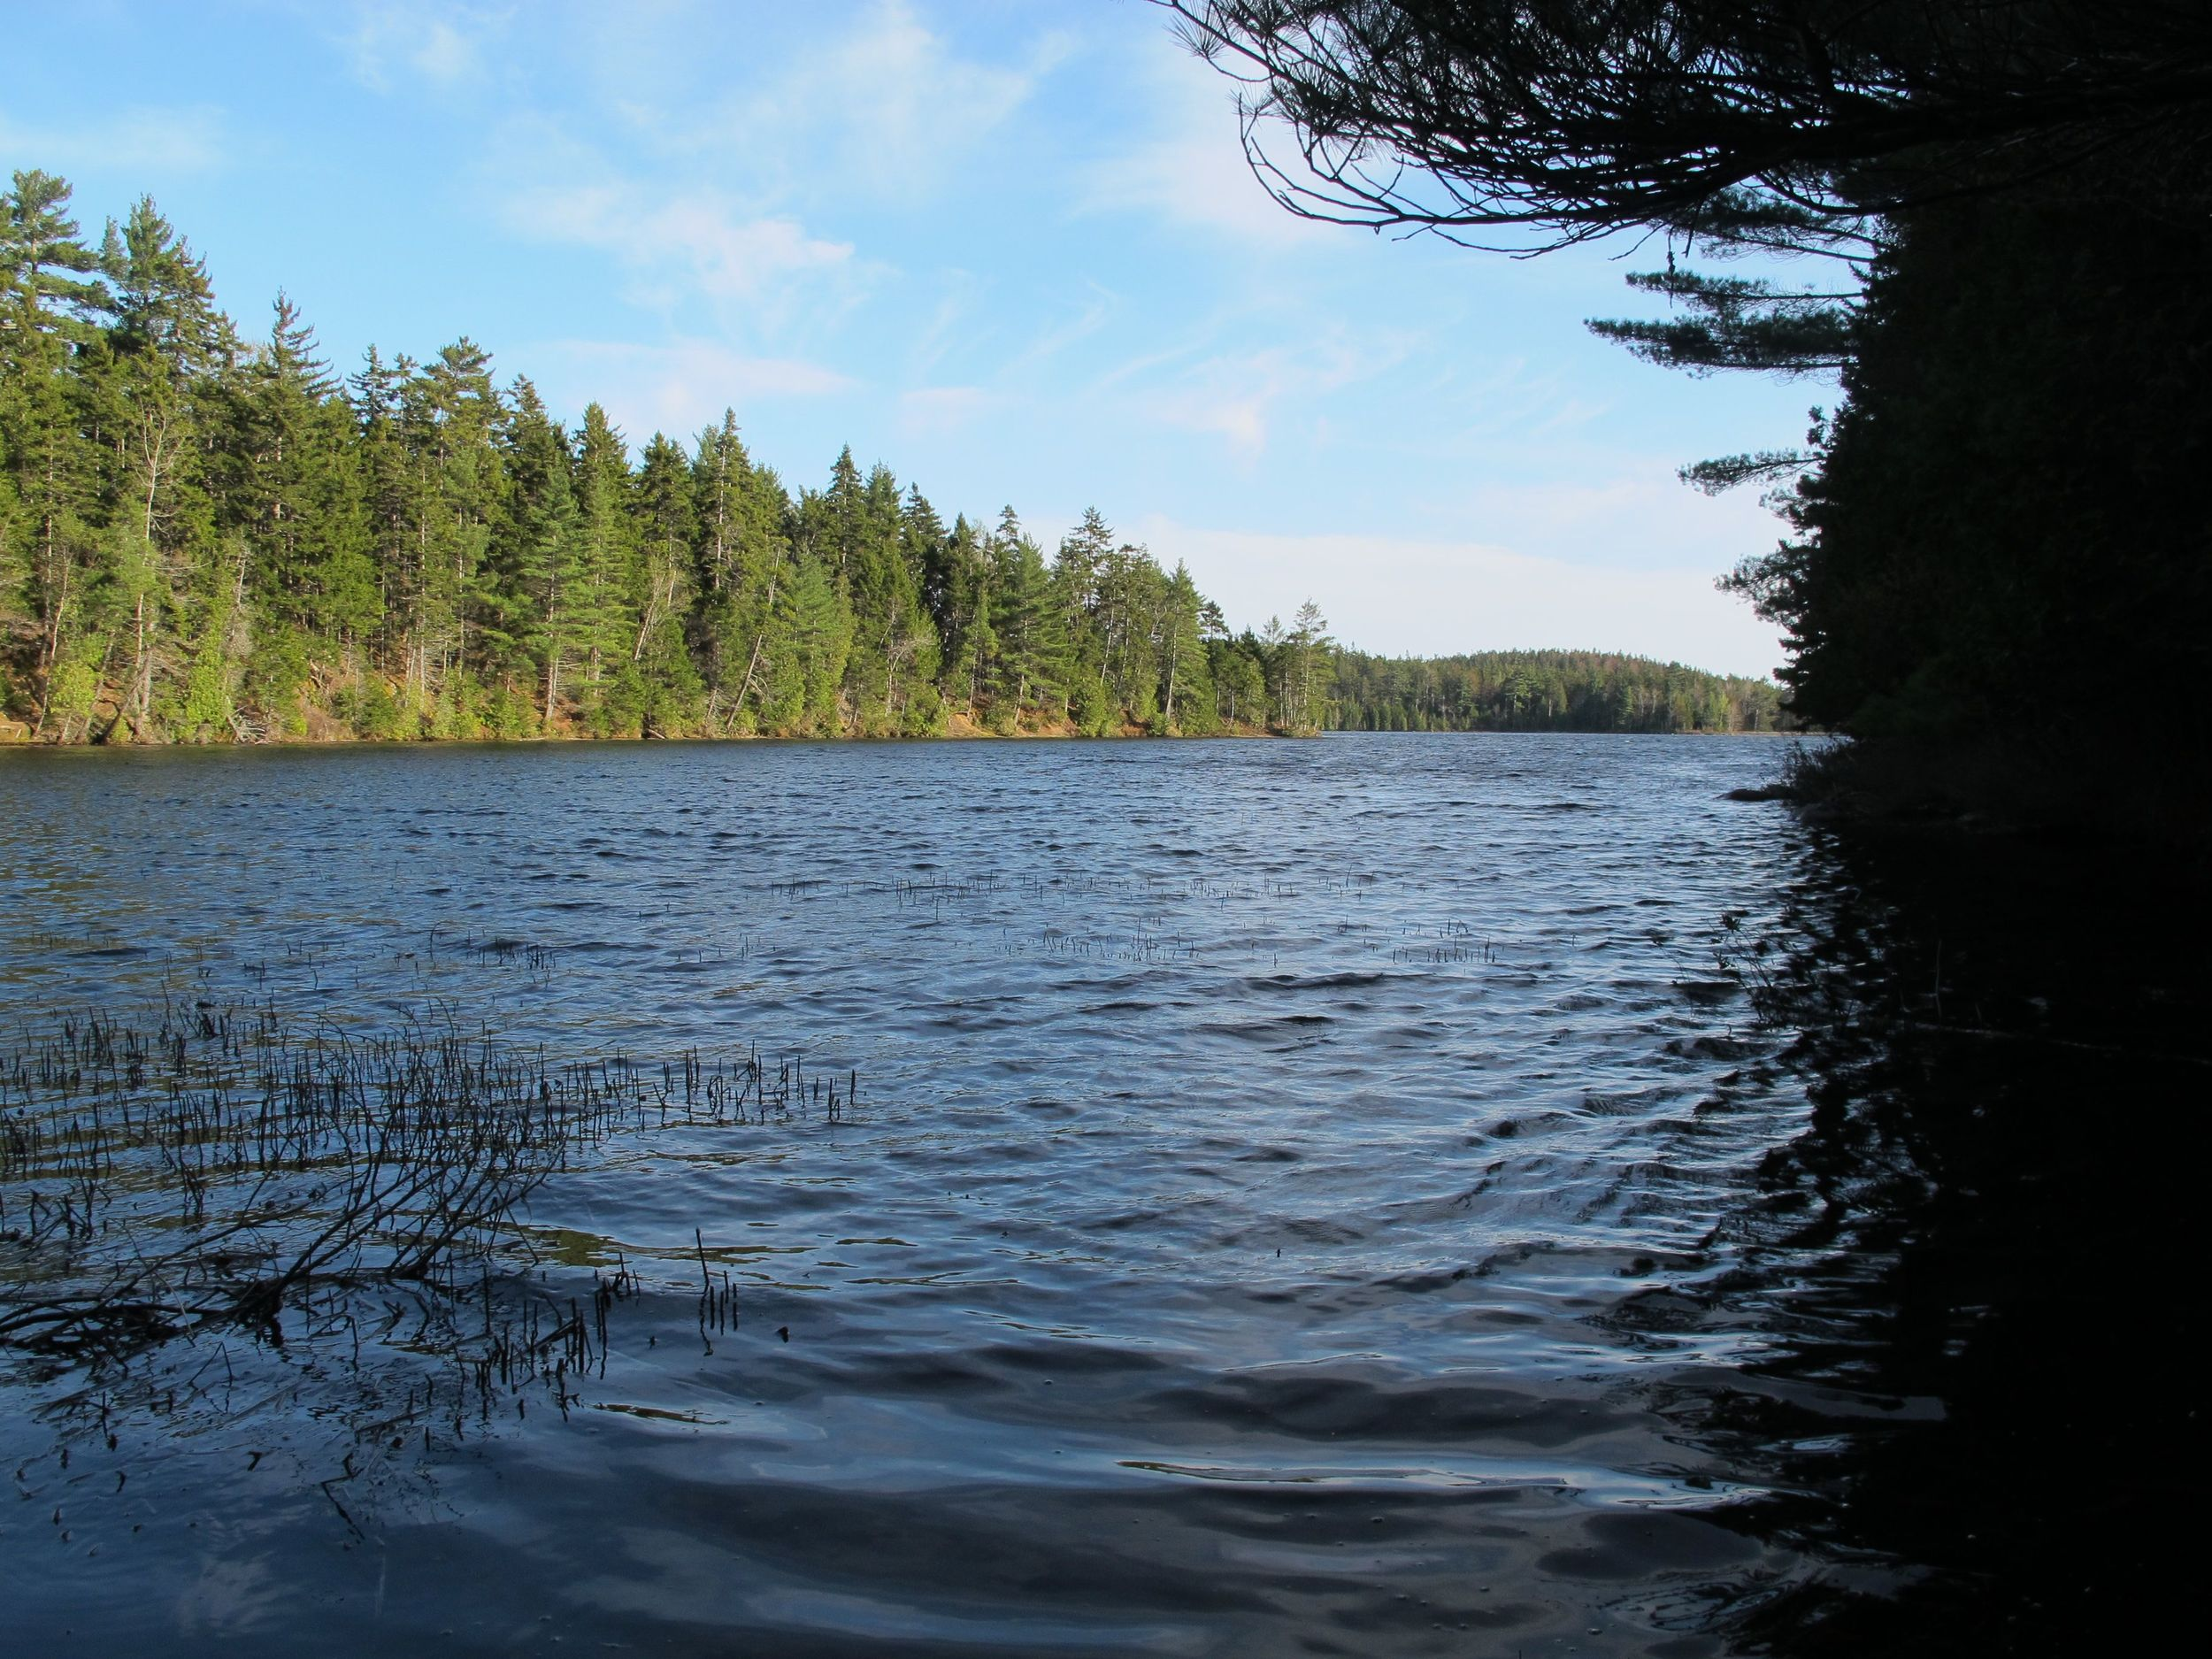 The edge of Lower Hadlock Pond.